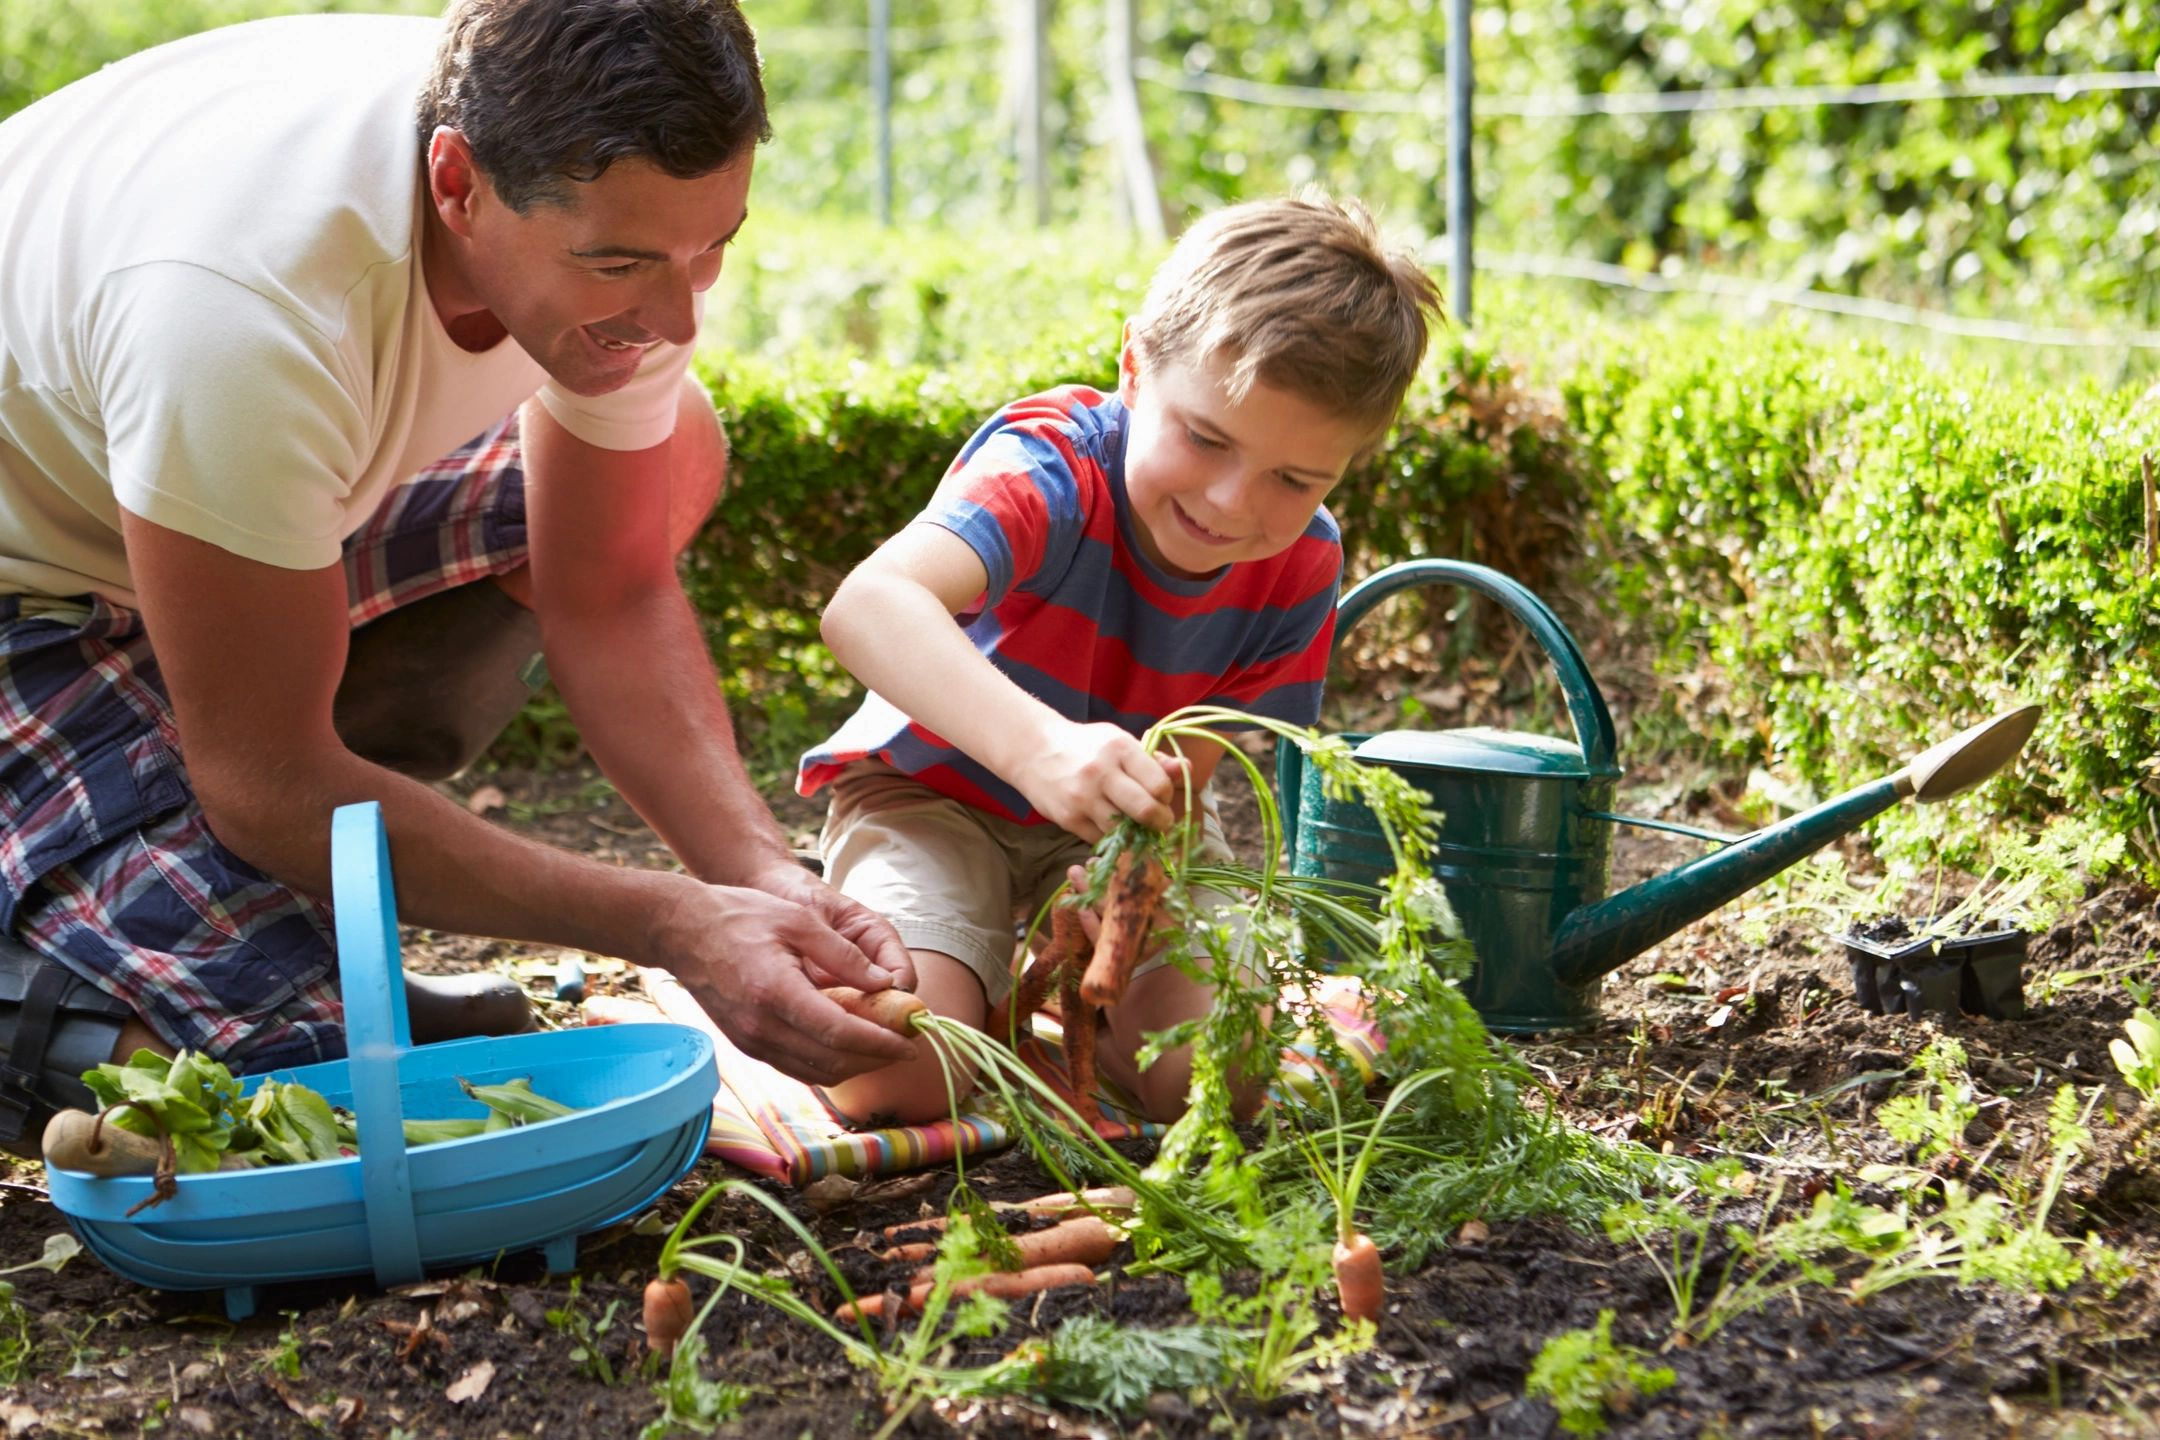 gardening, allergies, asthma, eczema, edina, woodbury